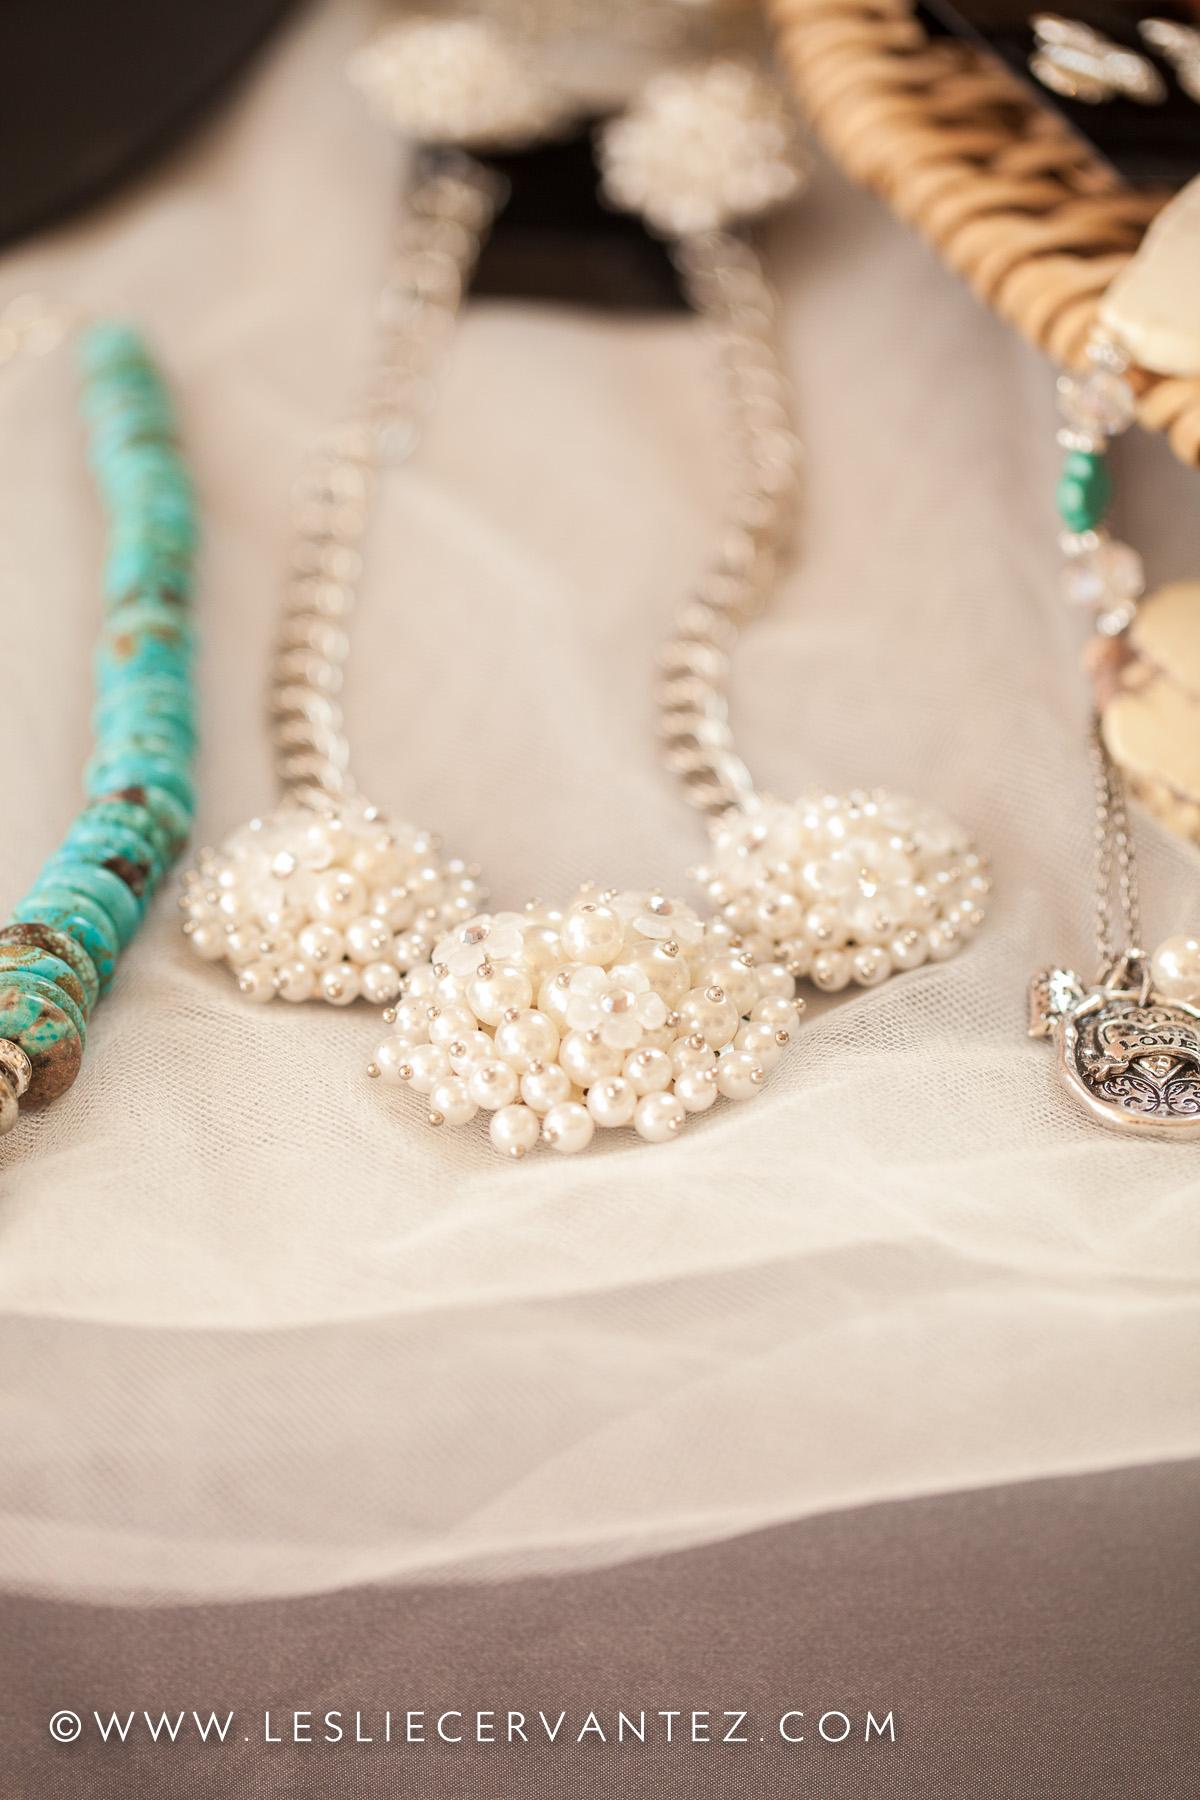 COVET - Custom Jewelry Designs